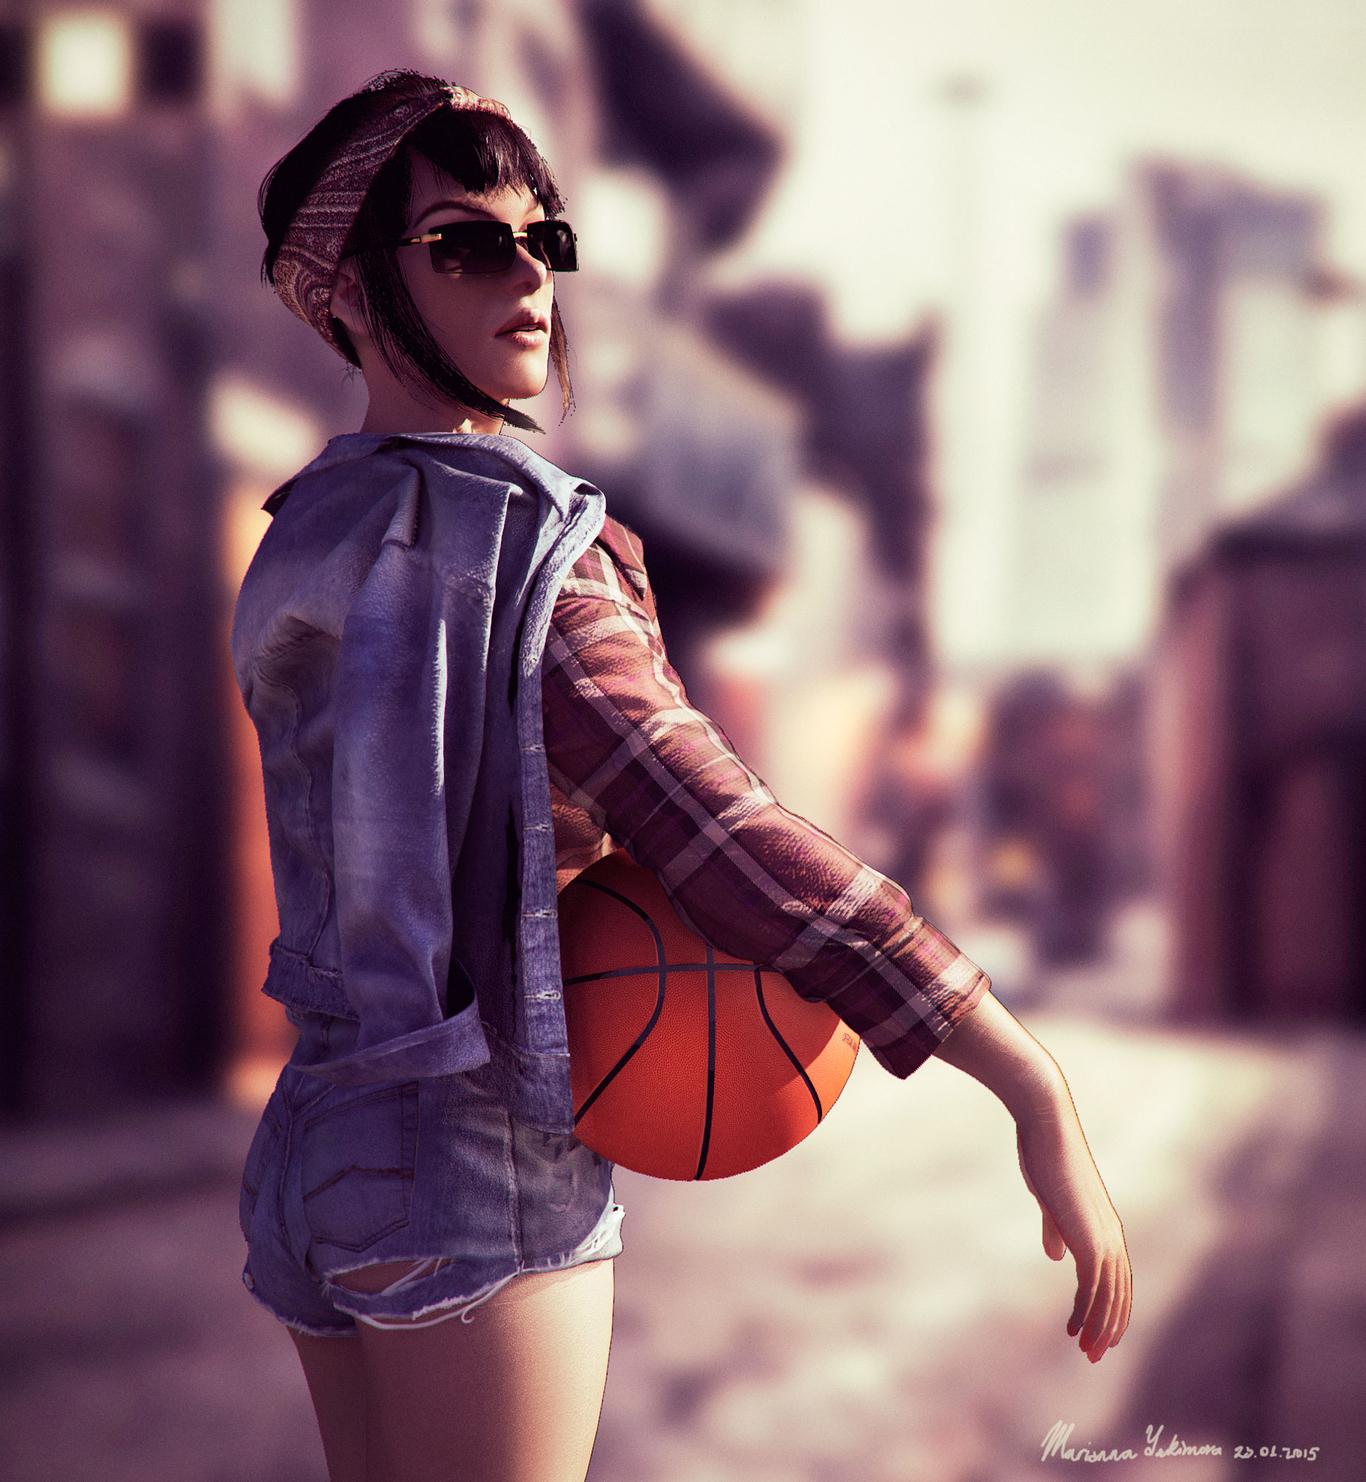 Mariannakot basketball girl 1 e9ed4d6b r1kn